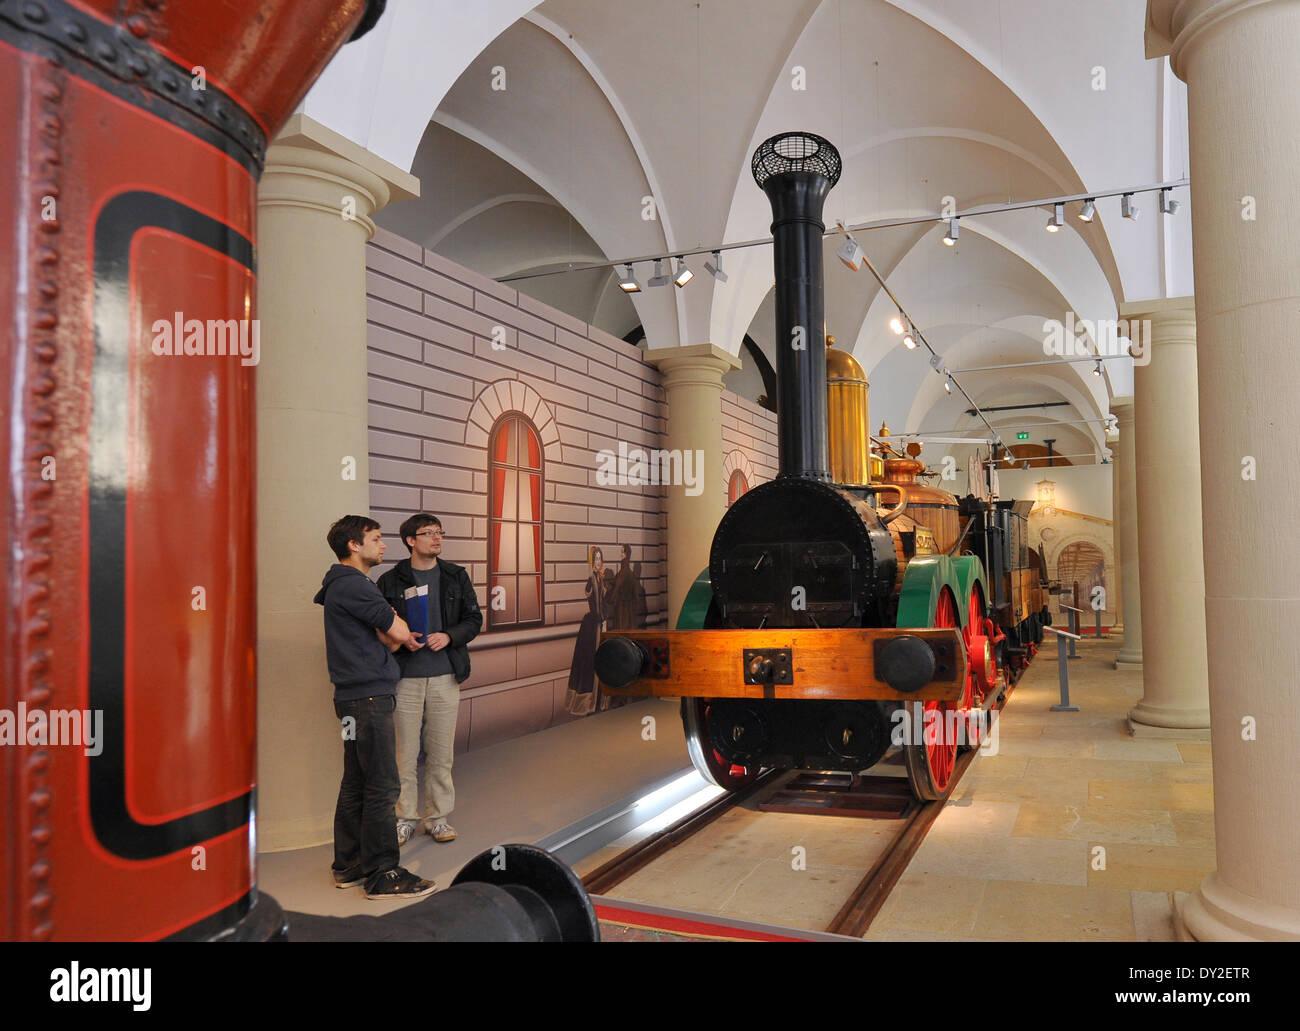 Replica first railway locomotive stock photos replica for Replica mobel deutschland